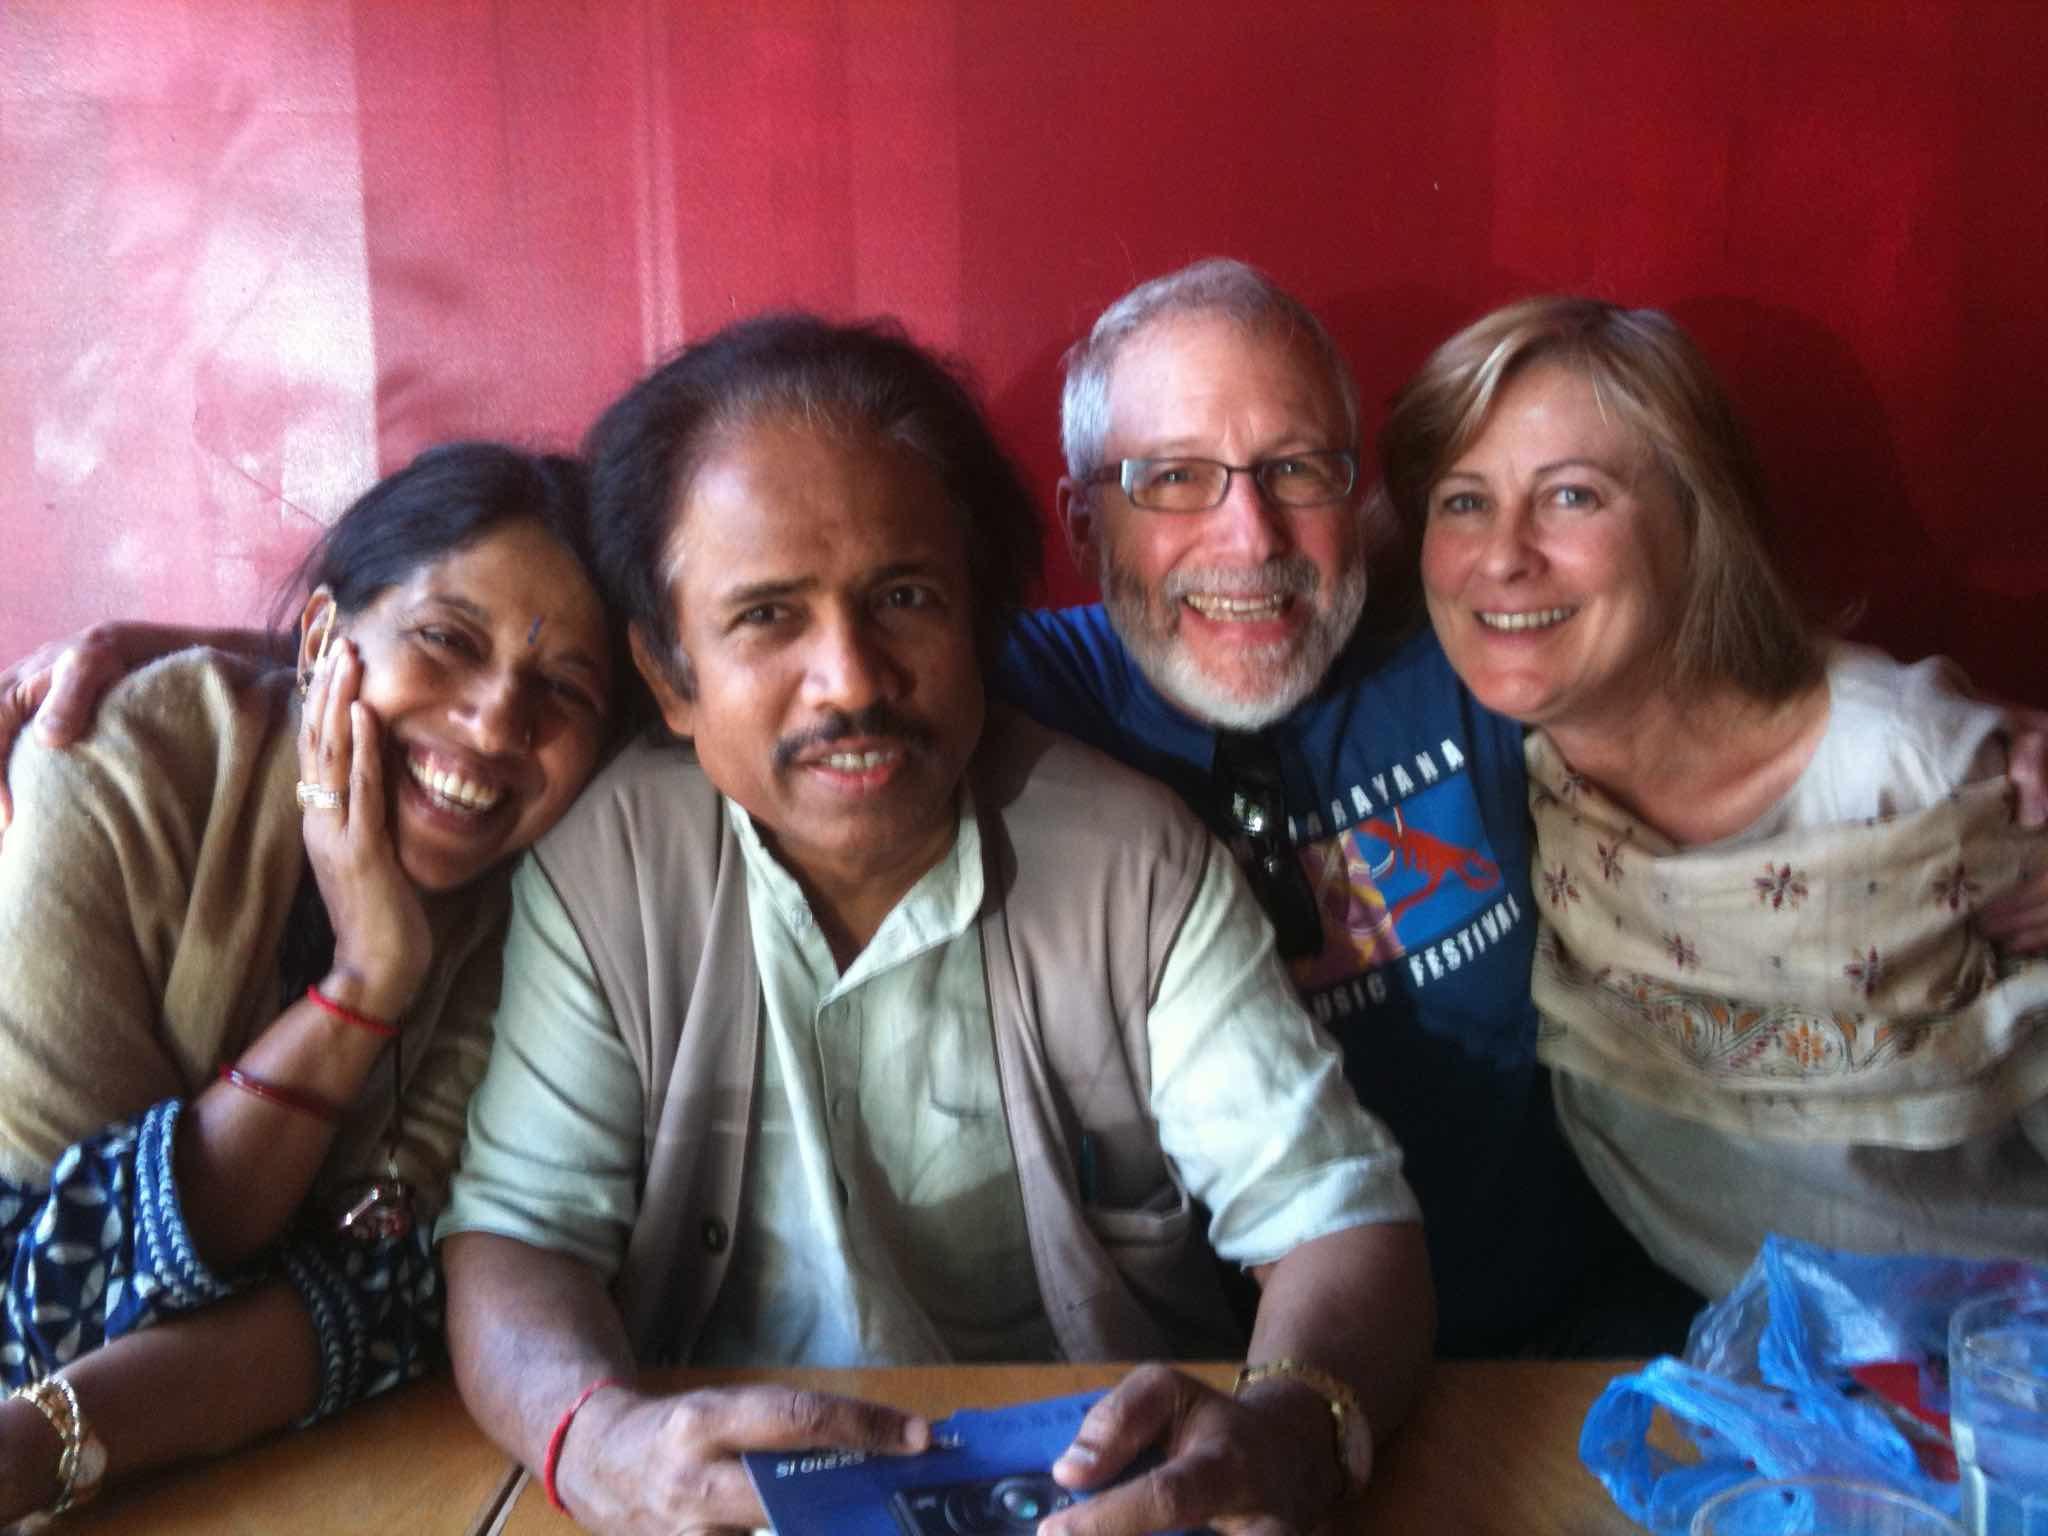 Kavita Krishnamurti, Dr. L. Subramaniam, Me and Holly